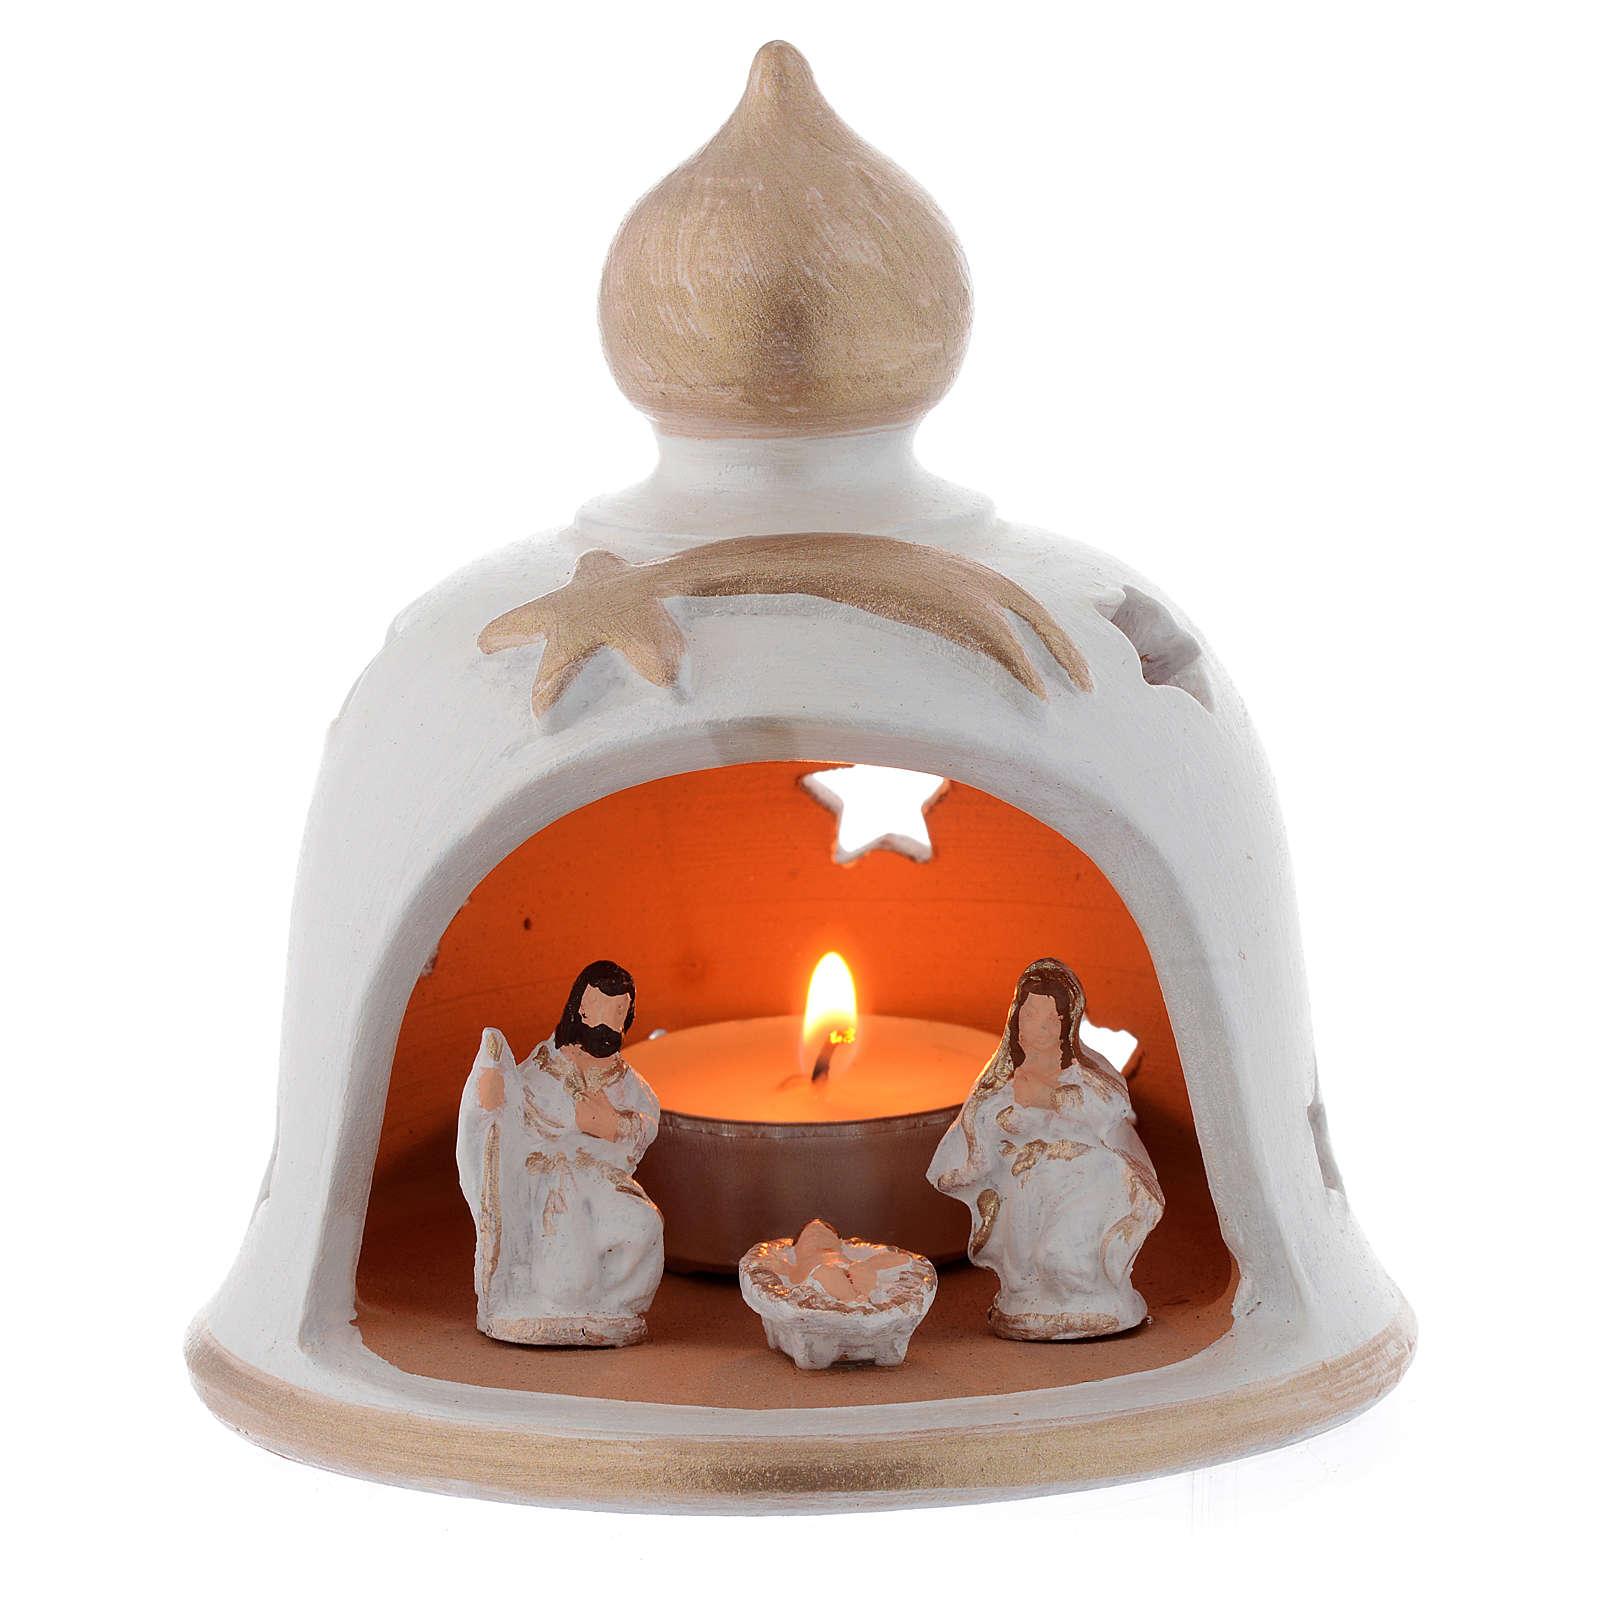 Candelero Navideño campana con Natividad terracota 13 cm 4